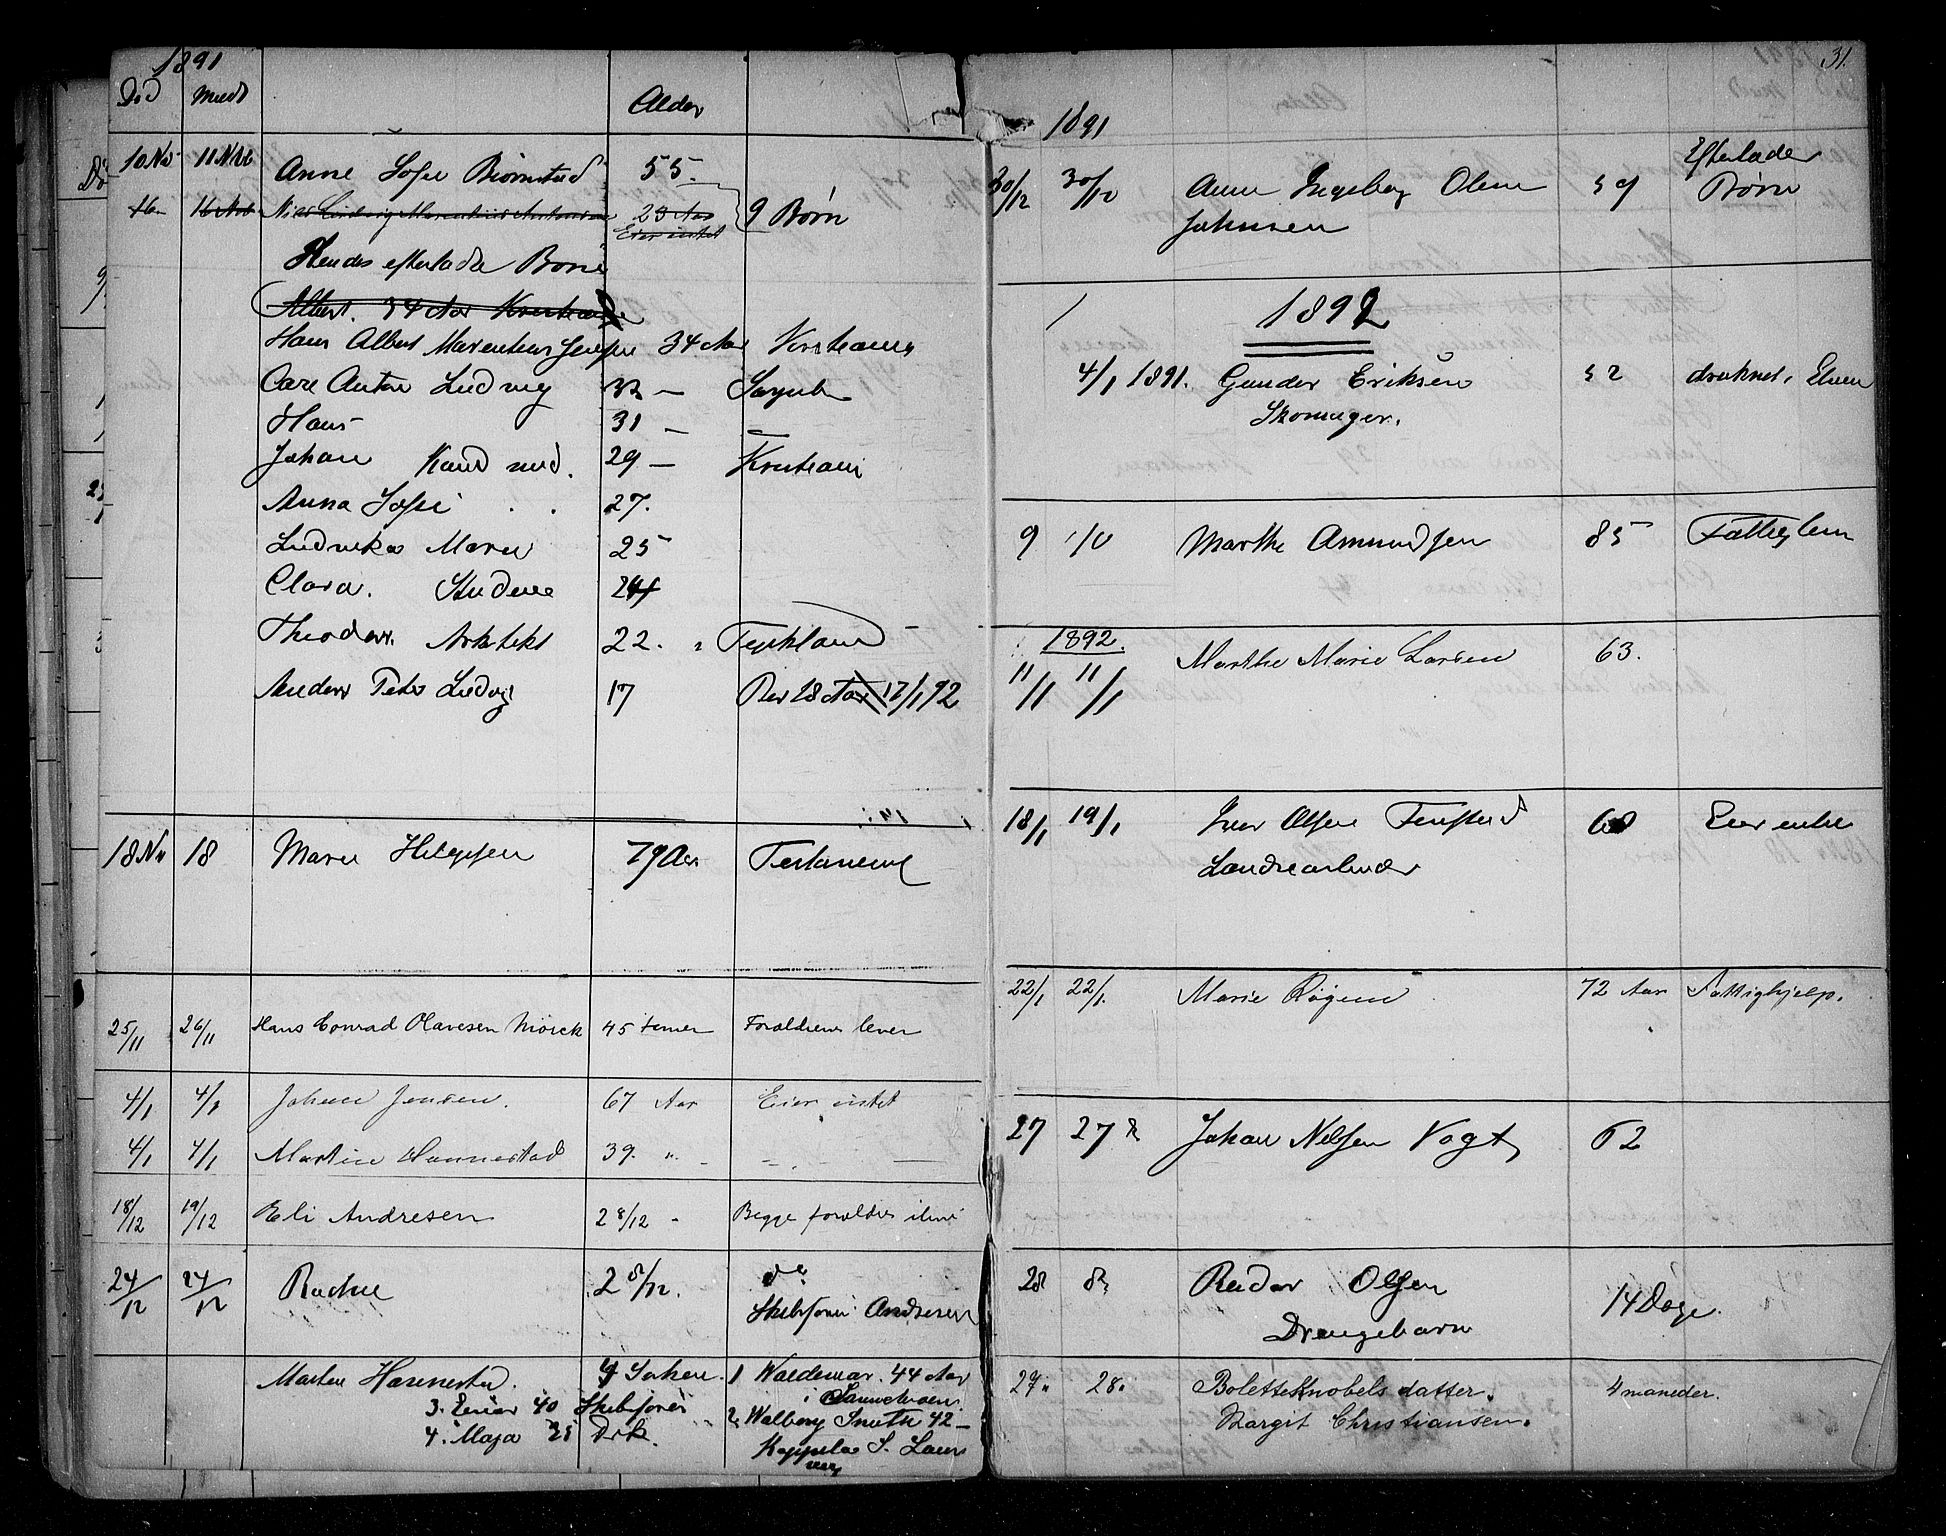 SAO, Sarpsborg byfogd, H/Ha/Haa/L0001: Dødsfallsprotokoll, 1880-1904, s. 30b-31a